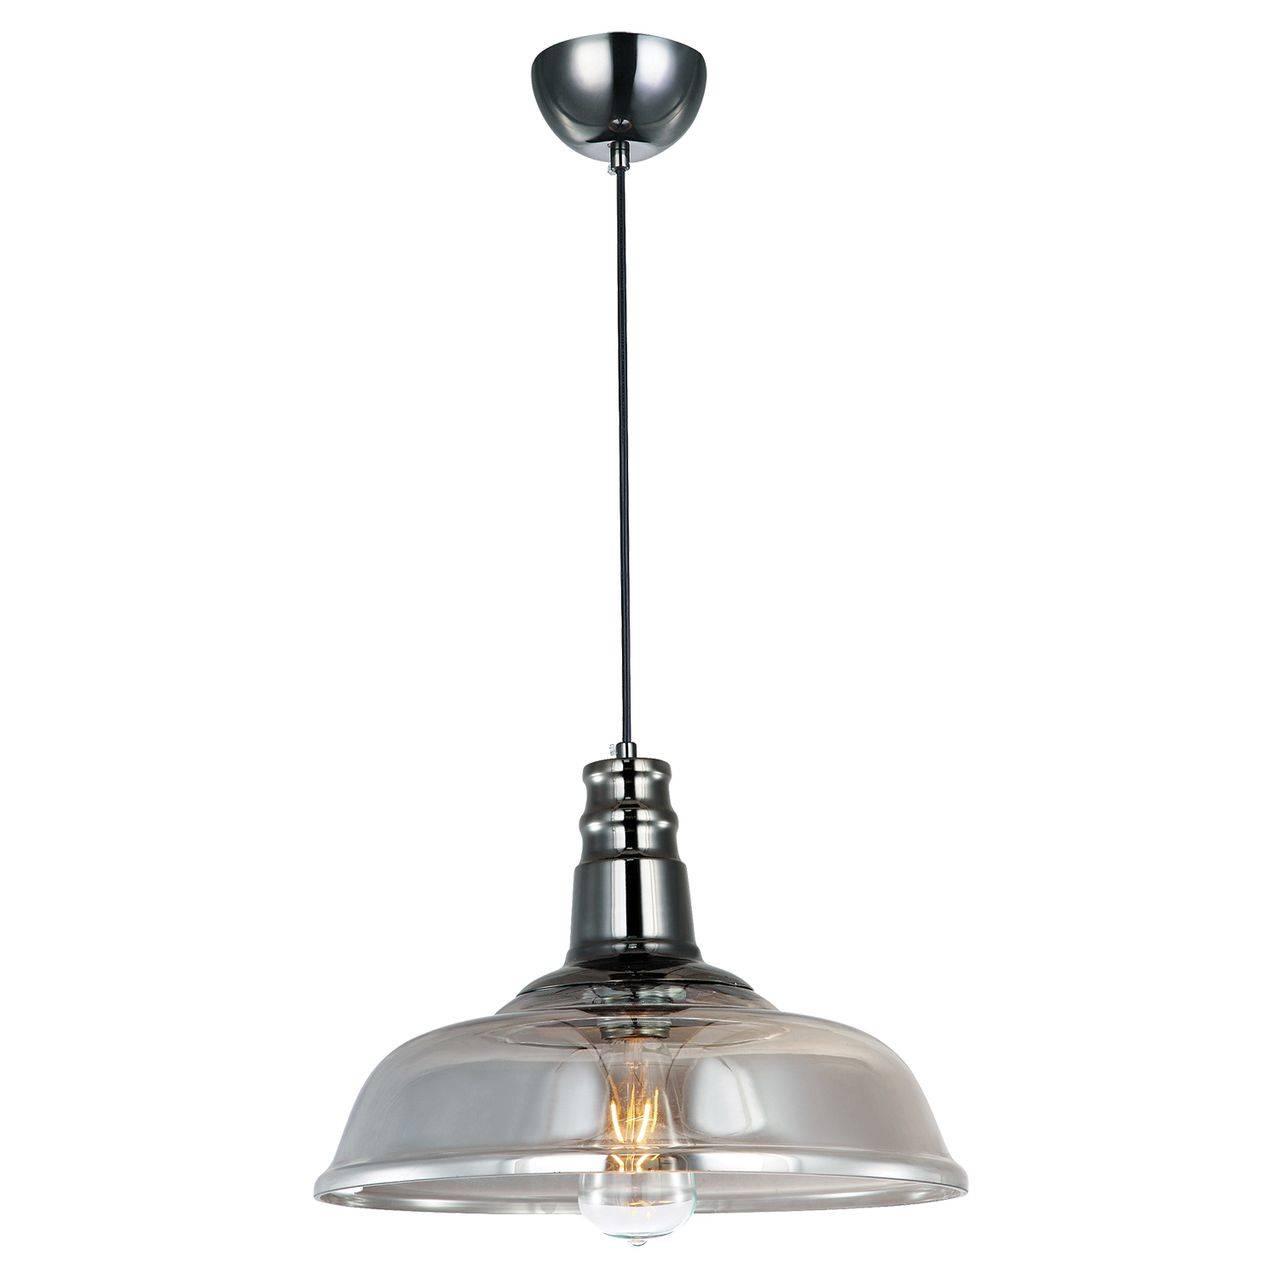 Подвесная лампа со стеклянным абажуром